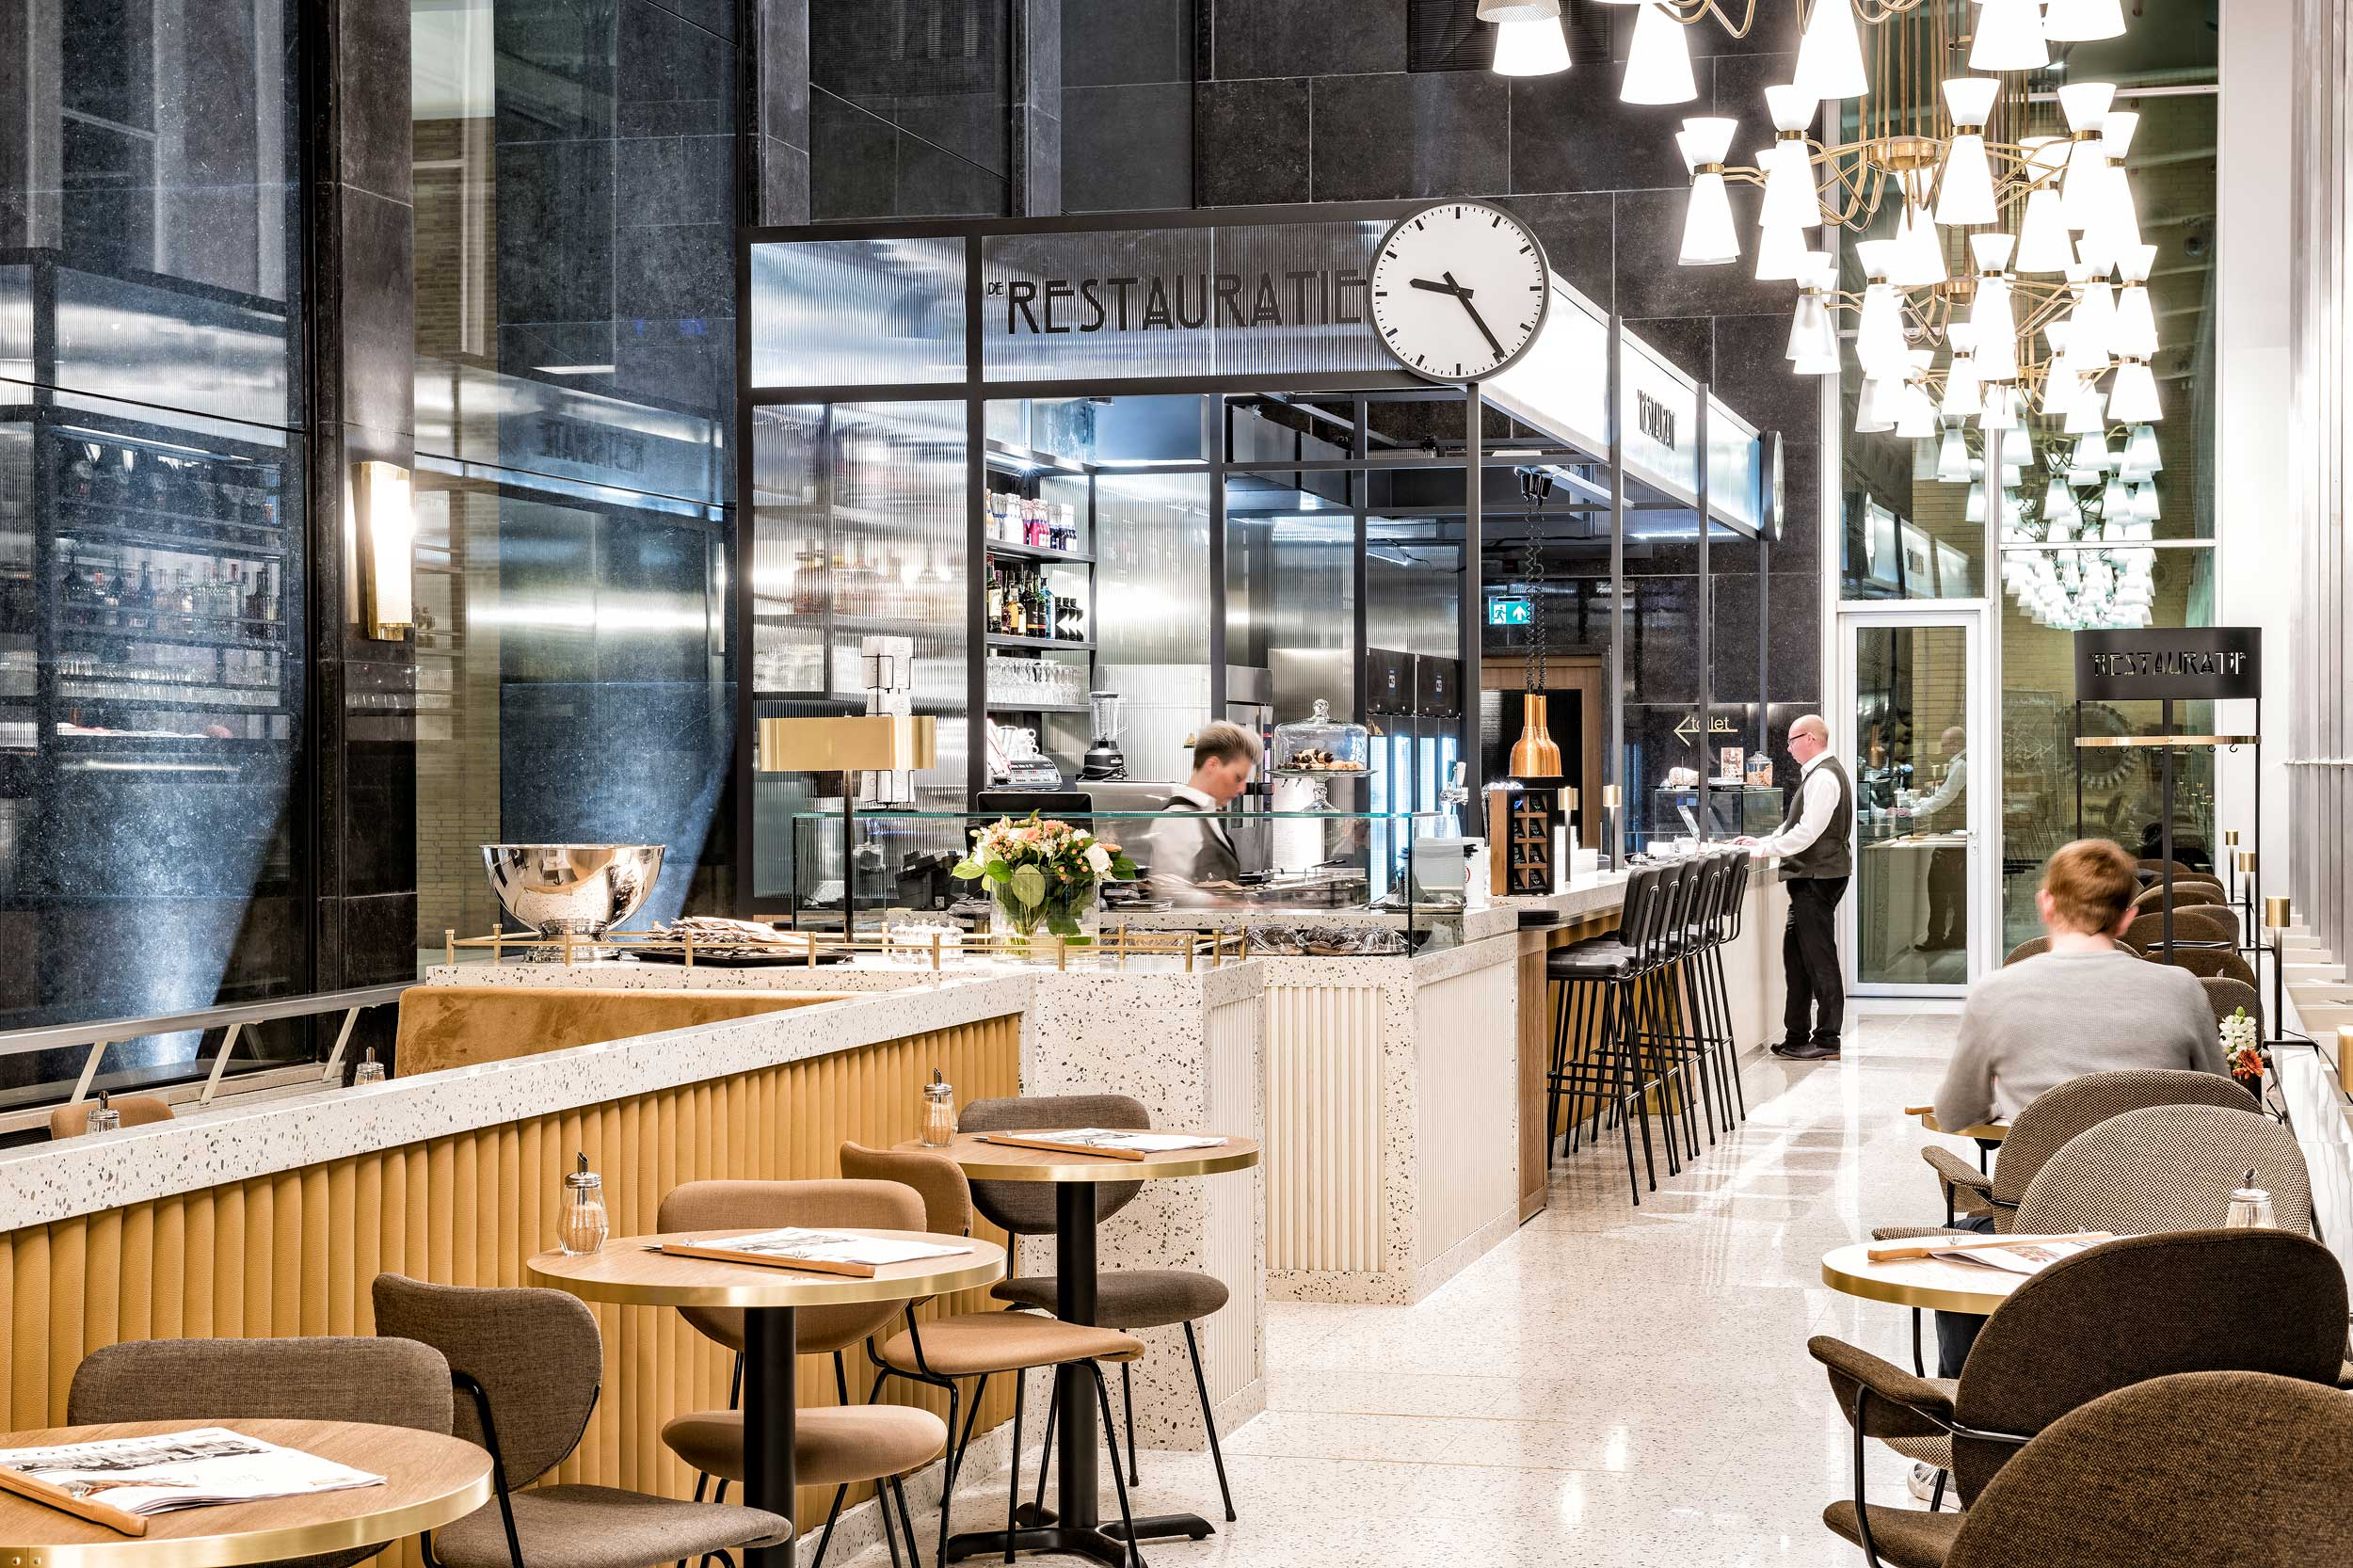 Station Eindhoven De Restauratie - fotografie Chiel de Nooyer, fotograaf interieur en architectuur